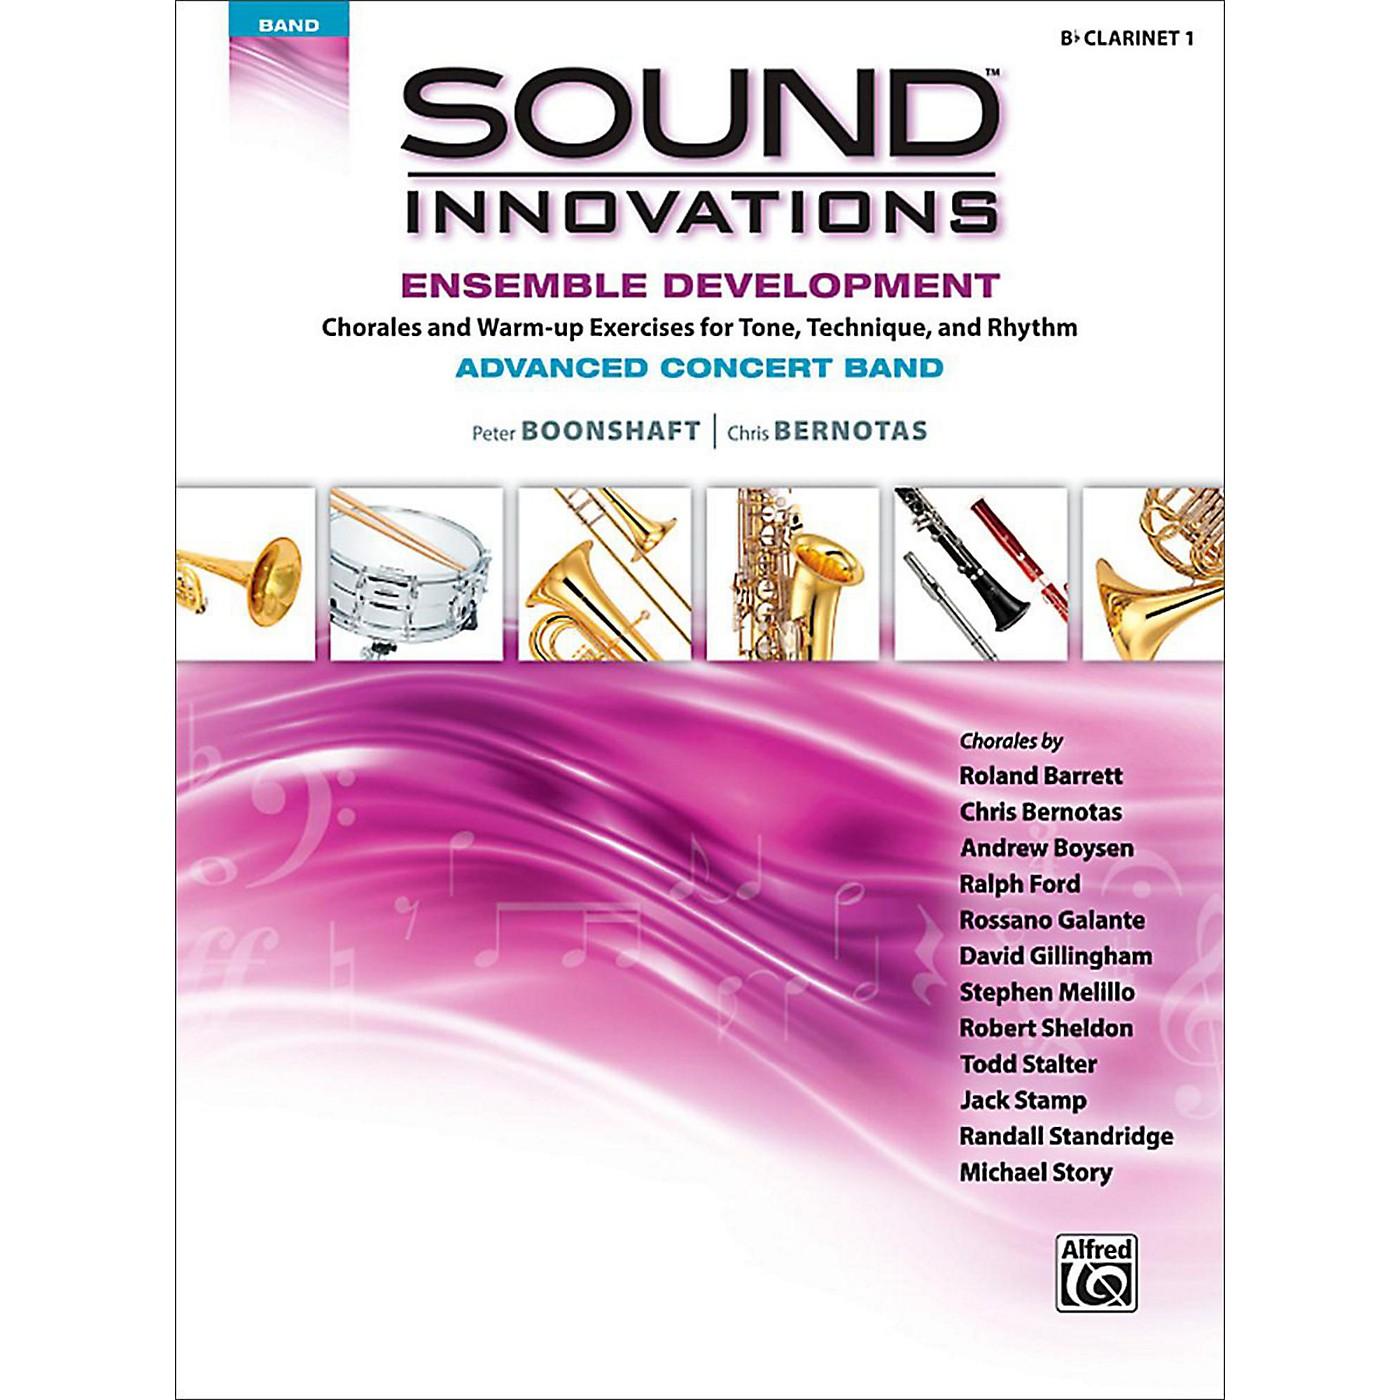 Alfred Sound Innovations Concert Band Ensemble Development Advanced Clarinet 1 thumbnail